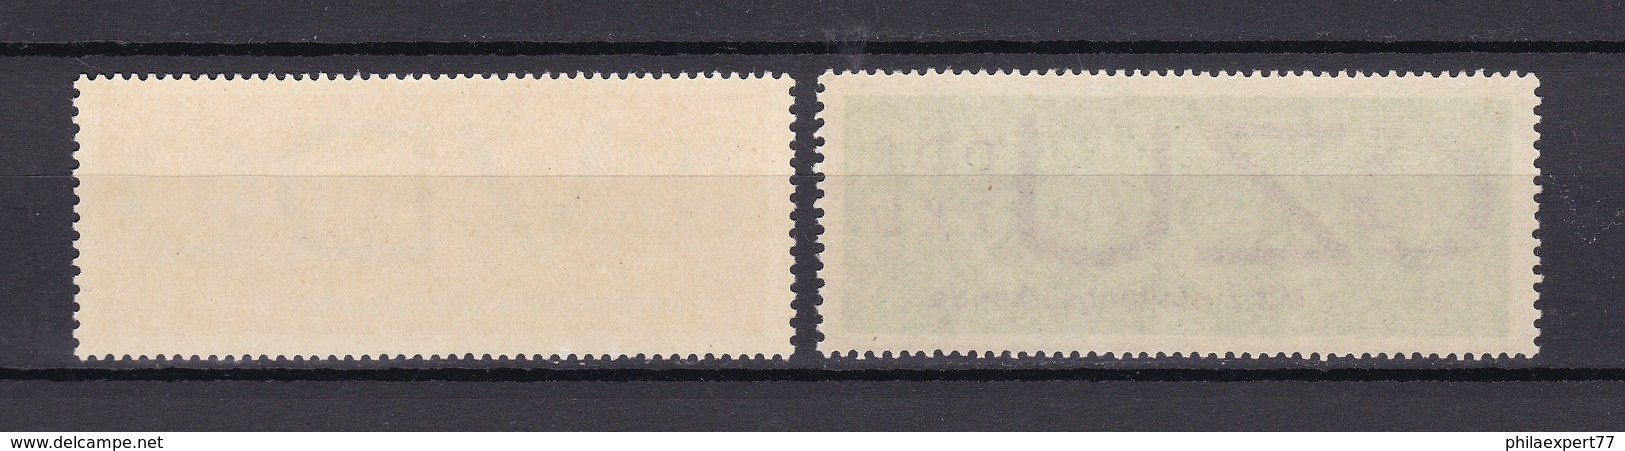 DDR - 1965/66 - Dienstmarken D/E - Michel Nr. 3 + 2 - Official